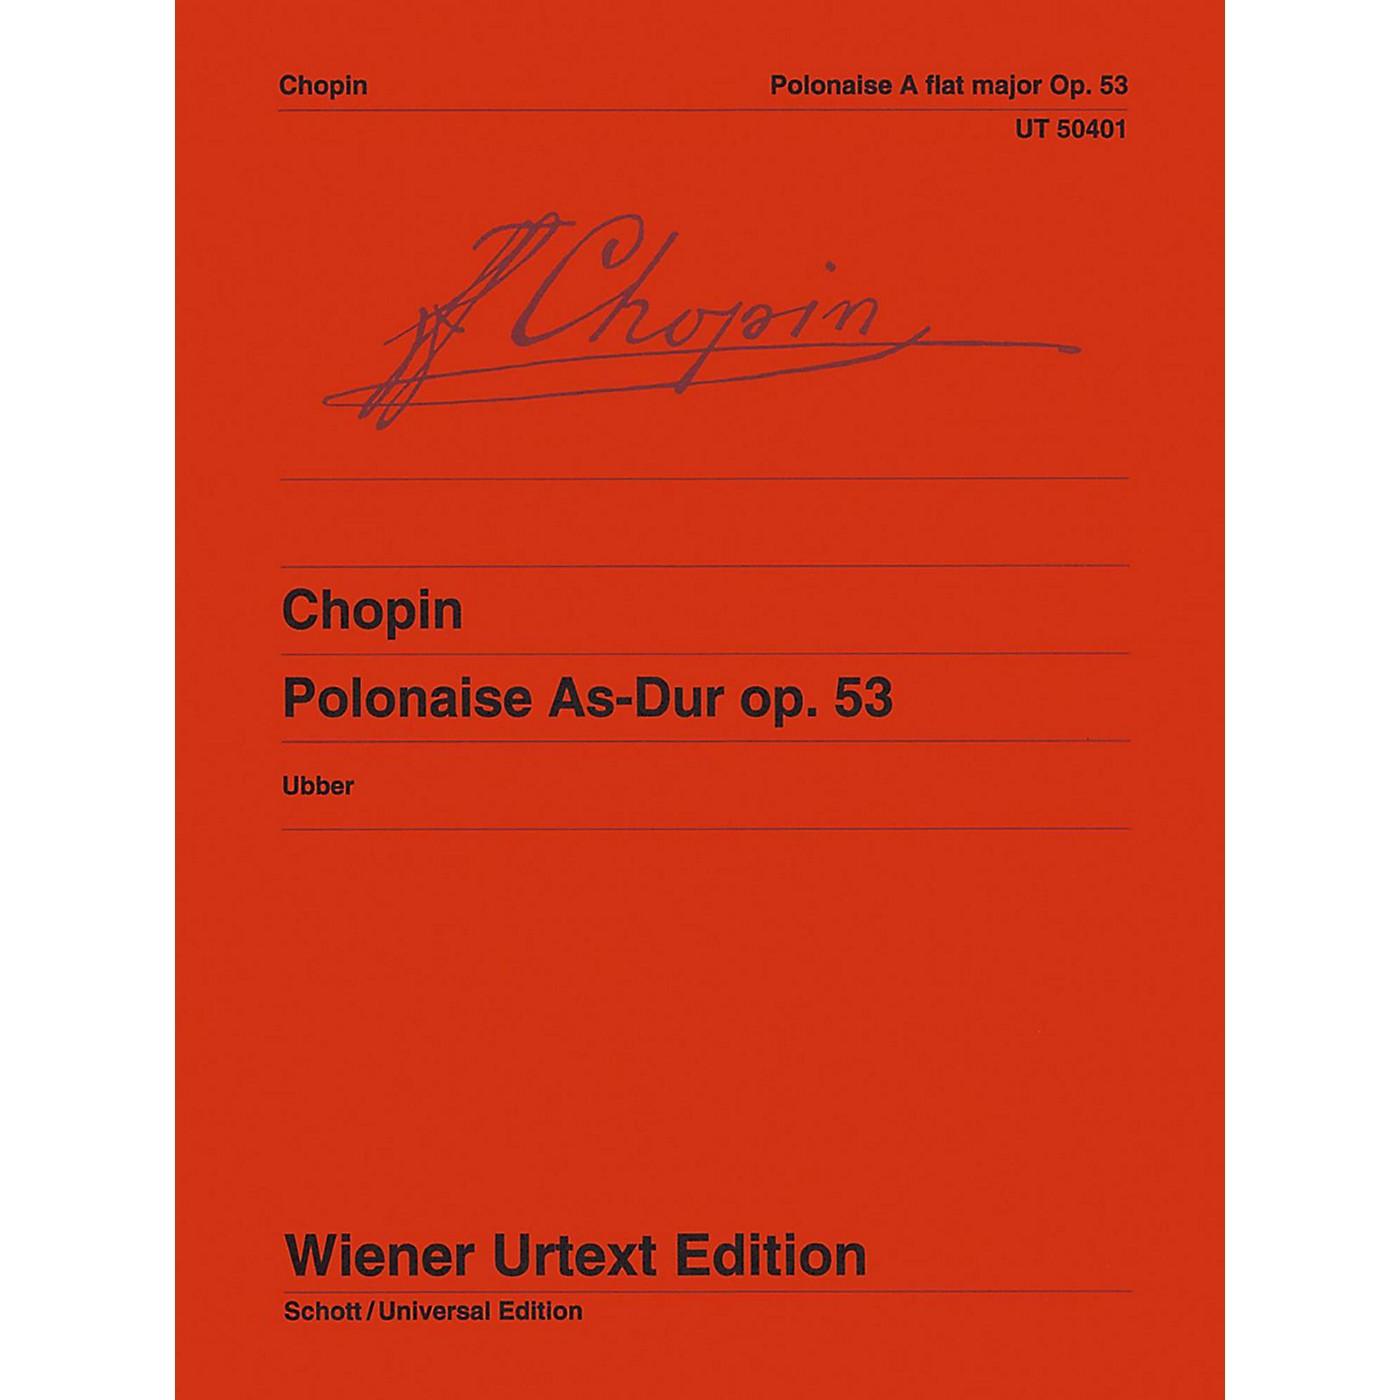 Carl Fischer Polonaise As-Dur Op. 53 - Piano thumbnail